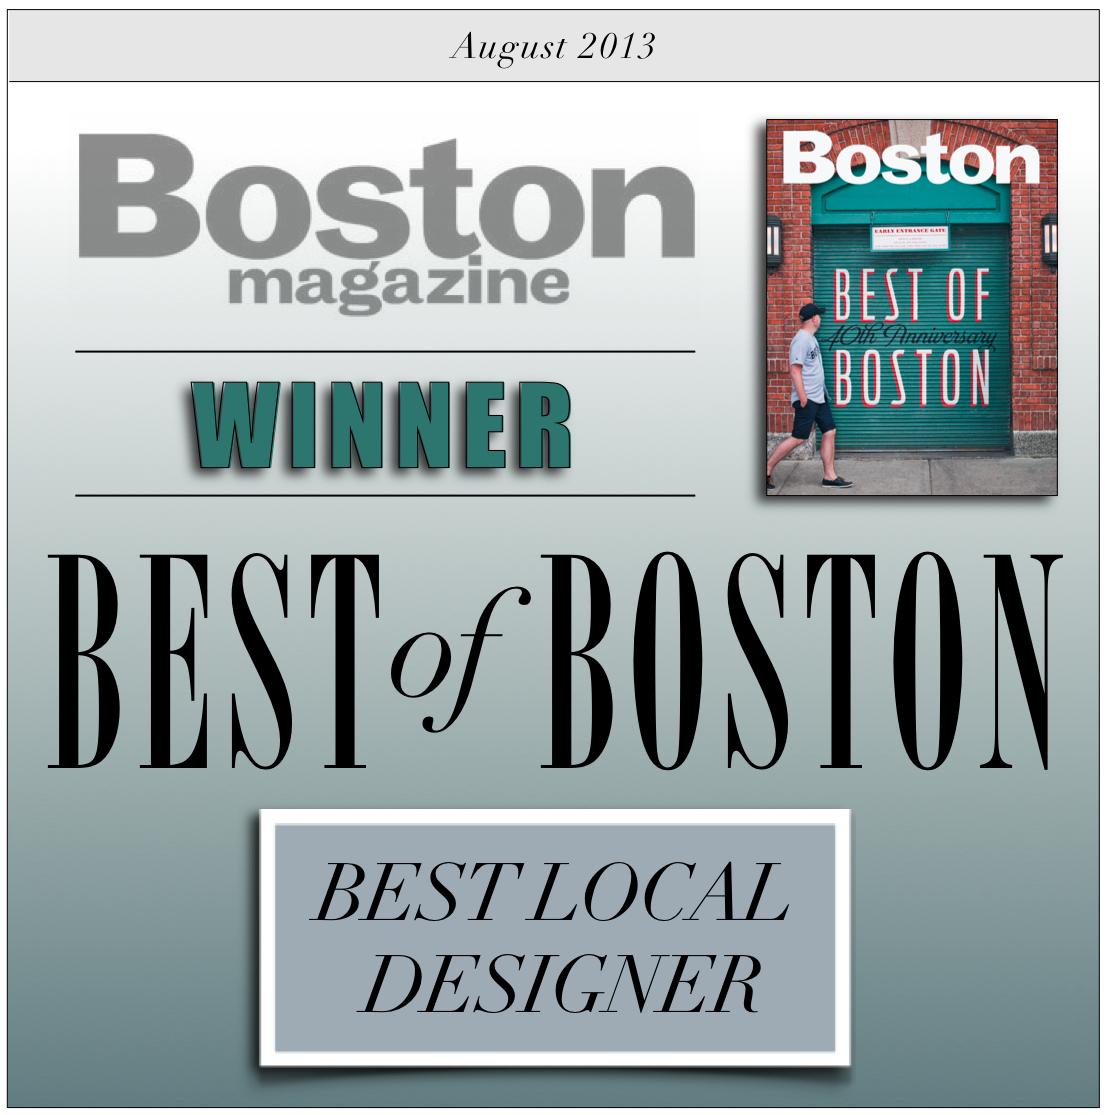 best of boston 2013.jpg